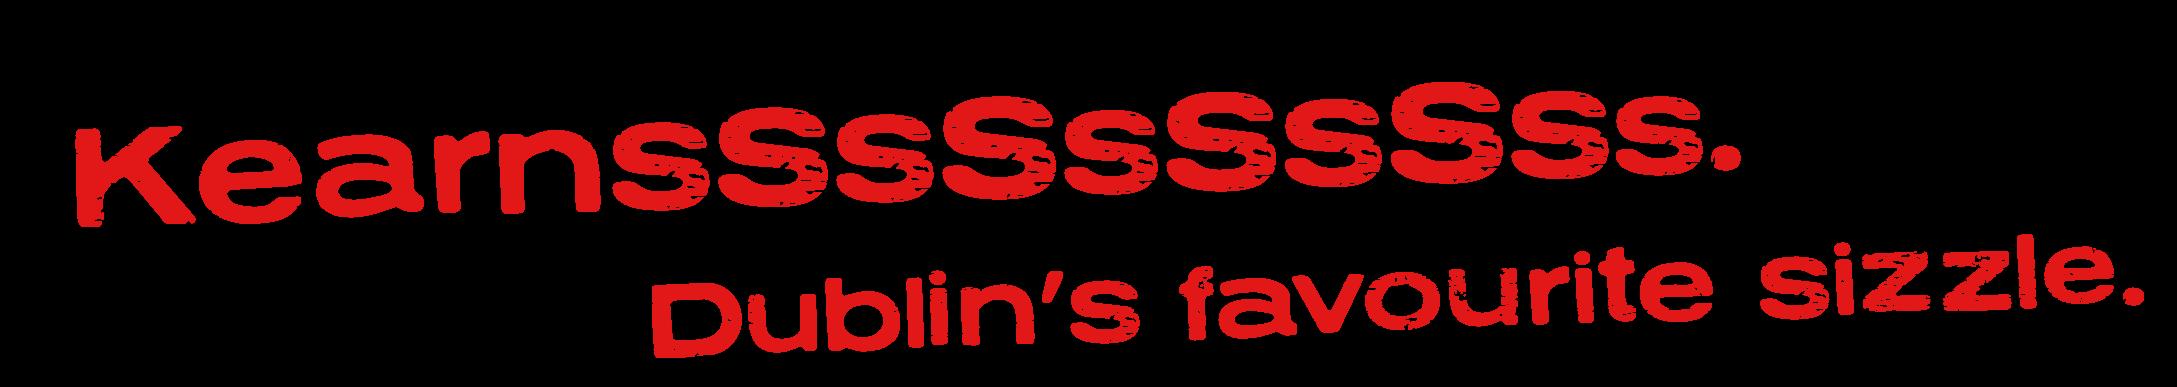 kearnsssss headline